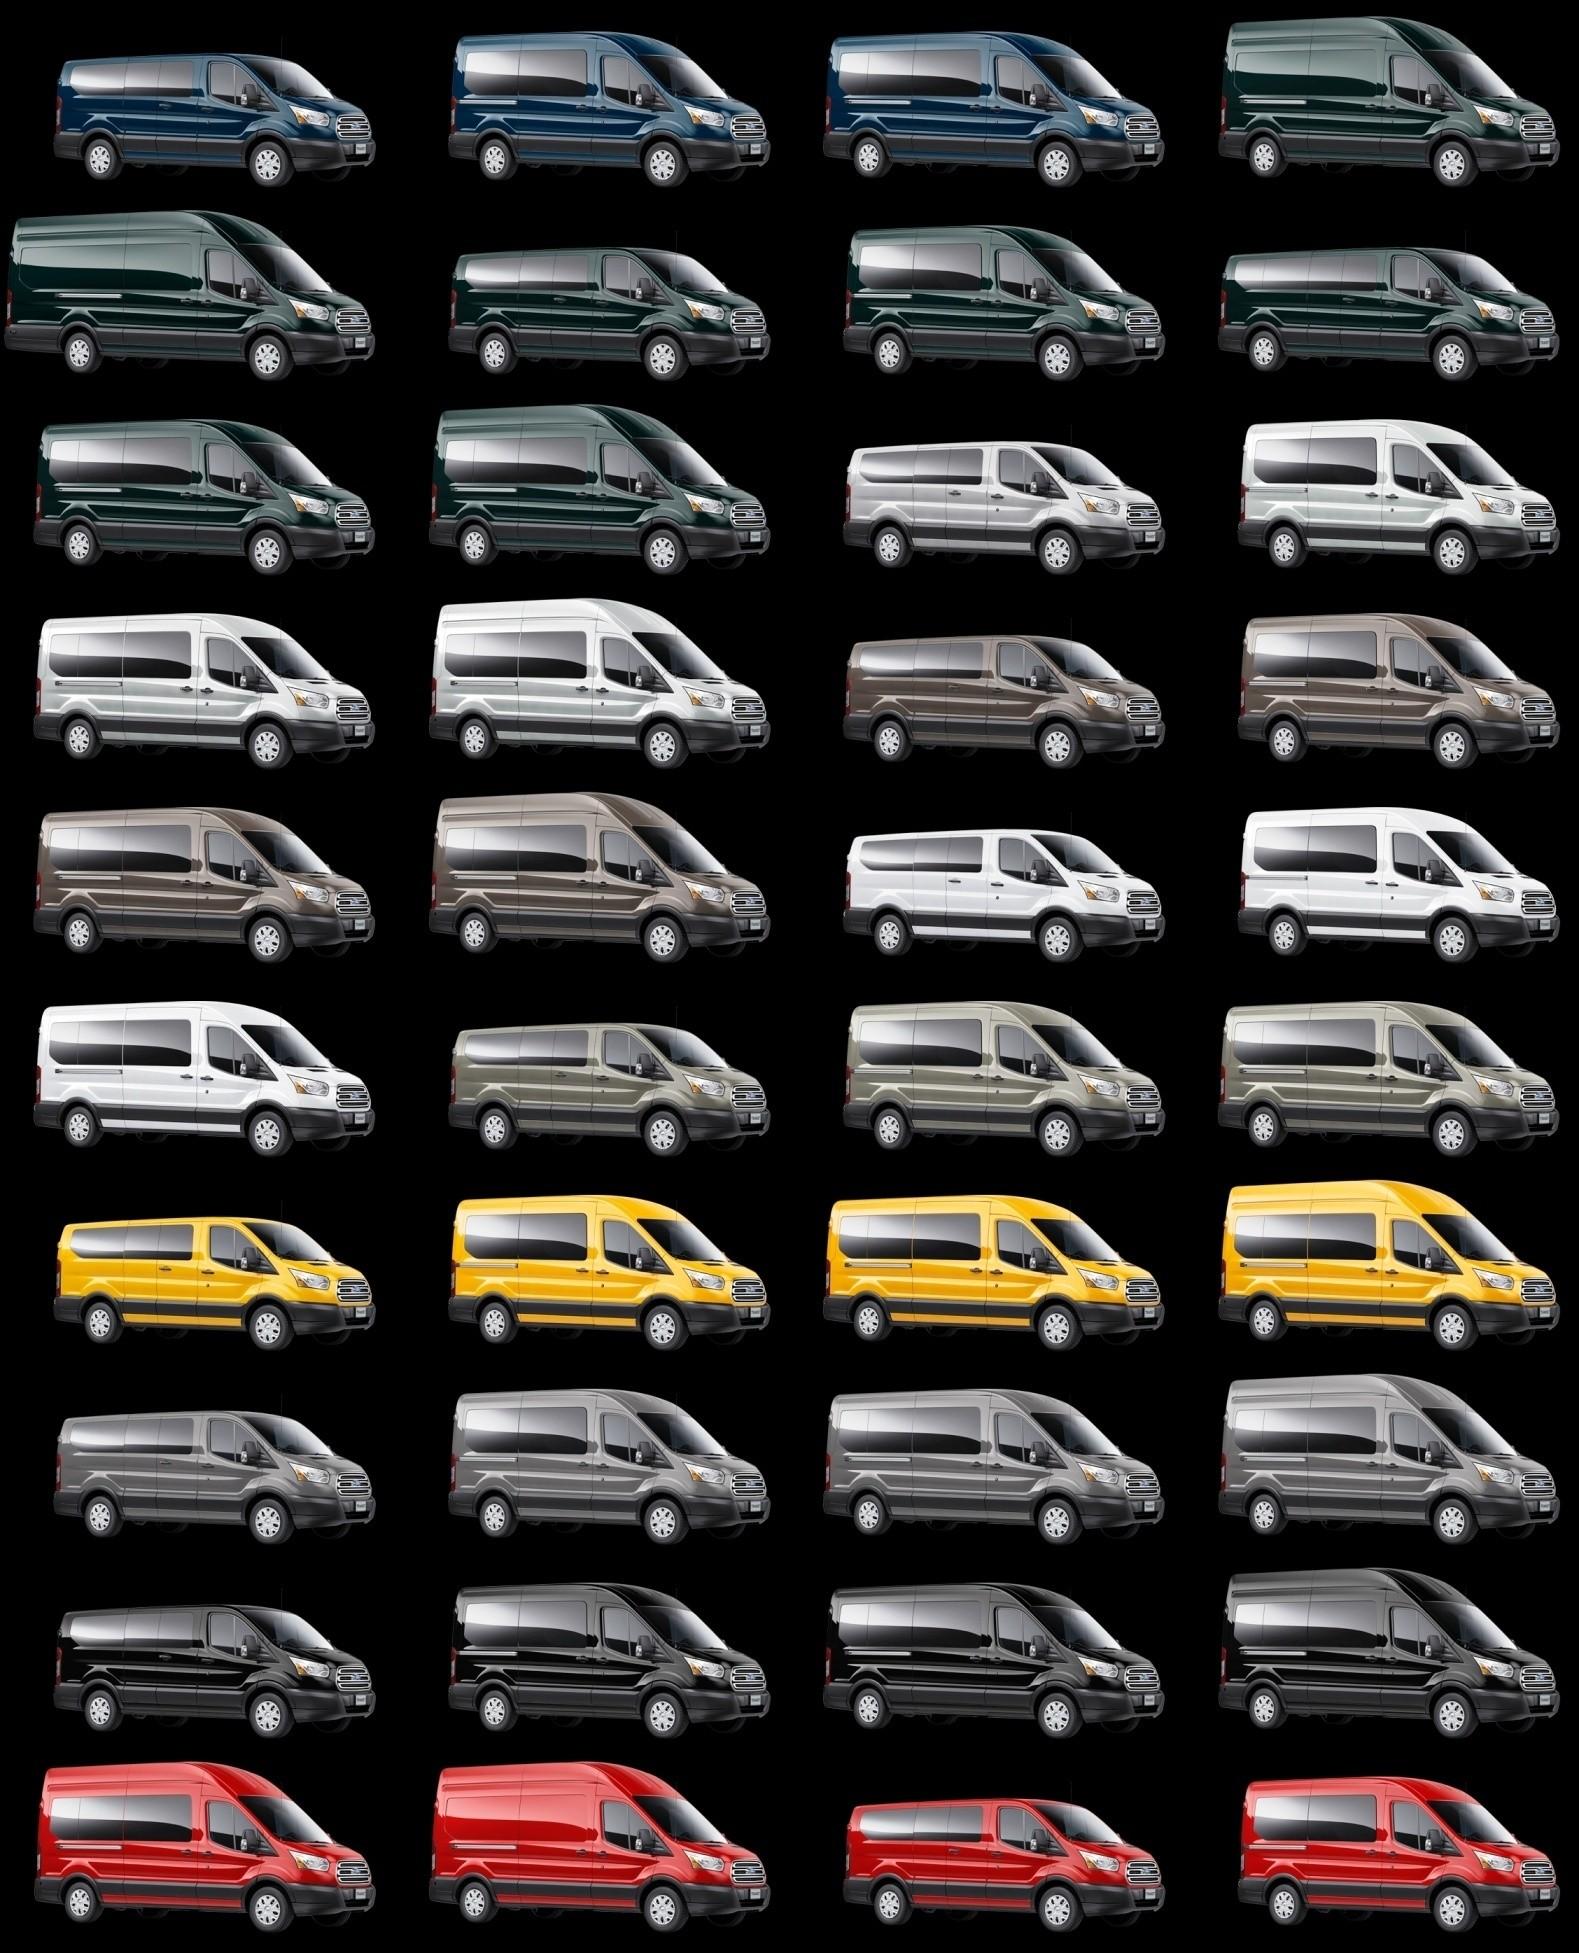 Silver 2015 FORD Transit Passenger Van GIF 2015 TRANSIT tiles  sc 1 st  Car-Revs-Daily.com & 2015 Ford Transit Is Nearly Here! Summer 2014 Arrival -- Work Van ... markmcfarlin.com